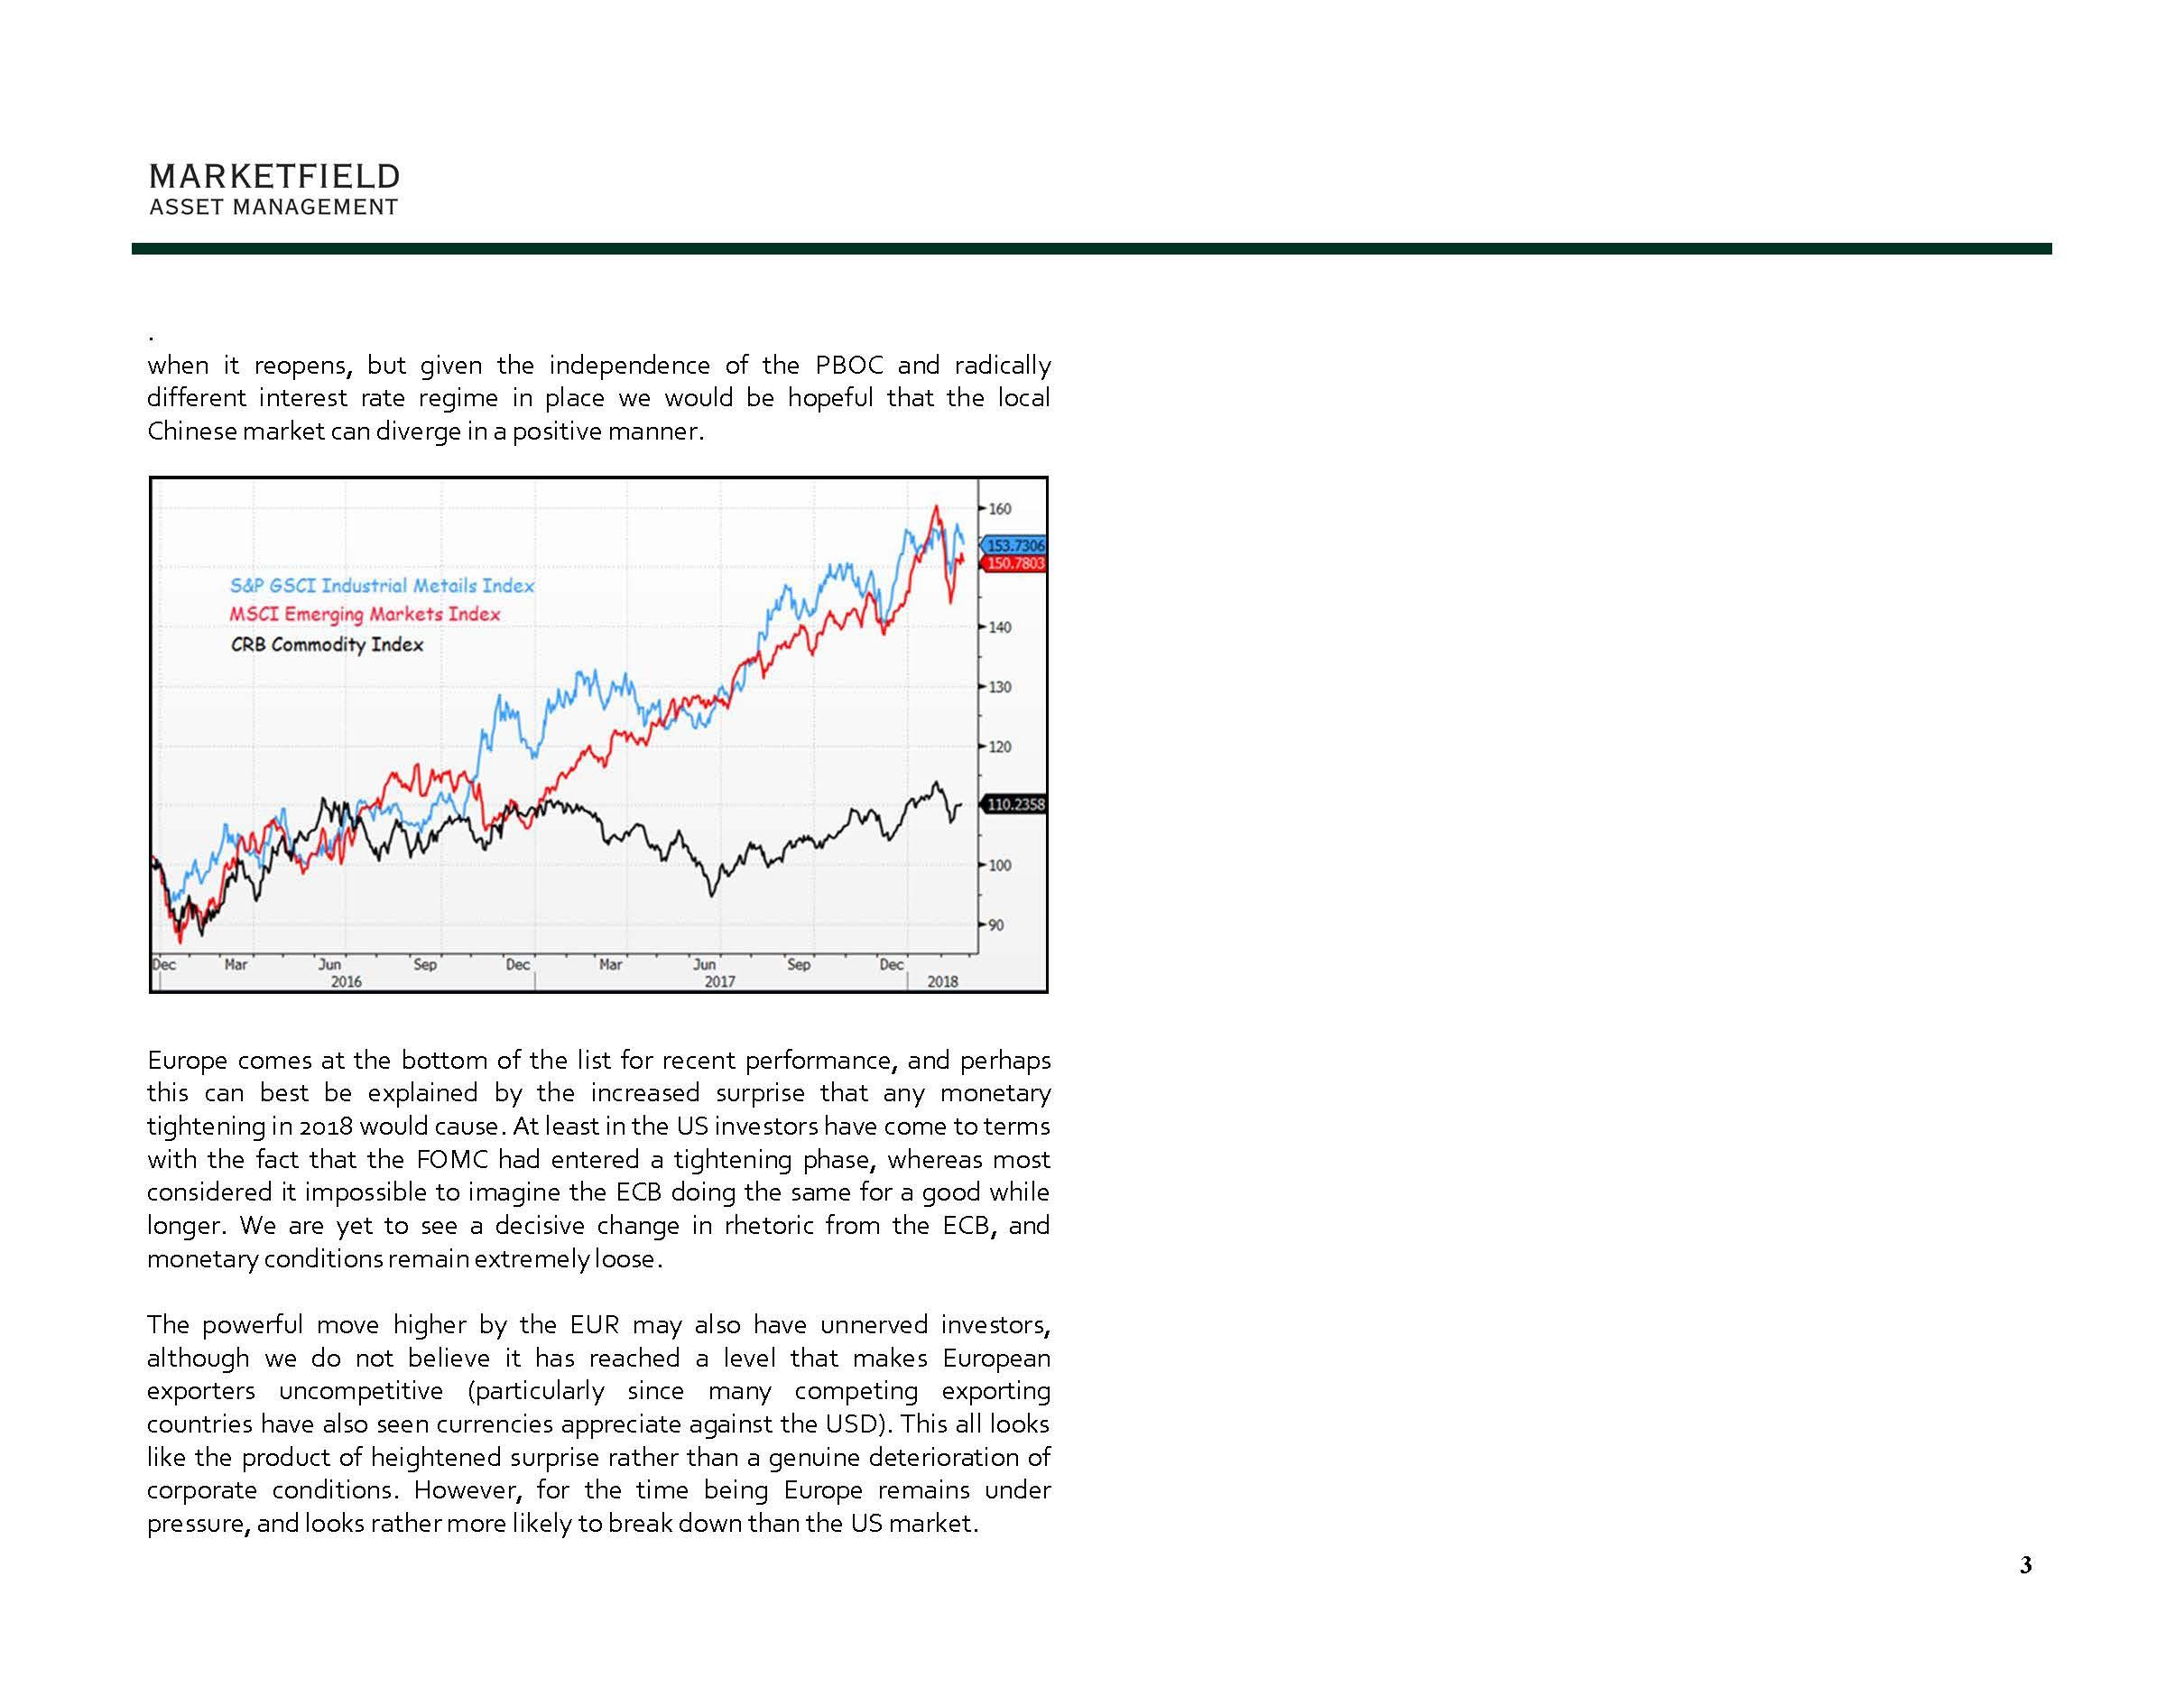 Marketfield Weekly Speculator 02-22-18_Page_03.jpg